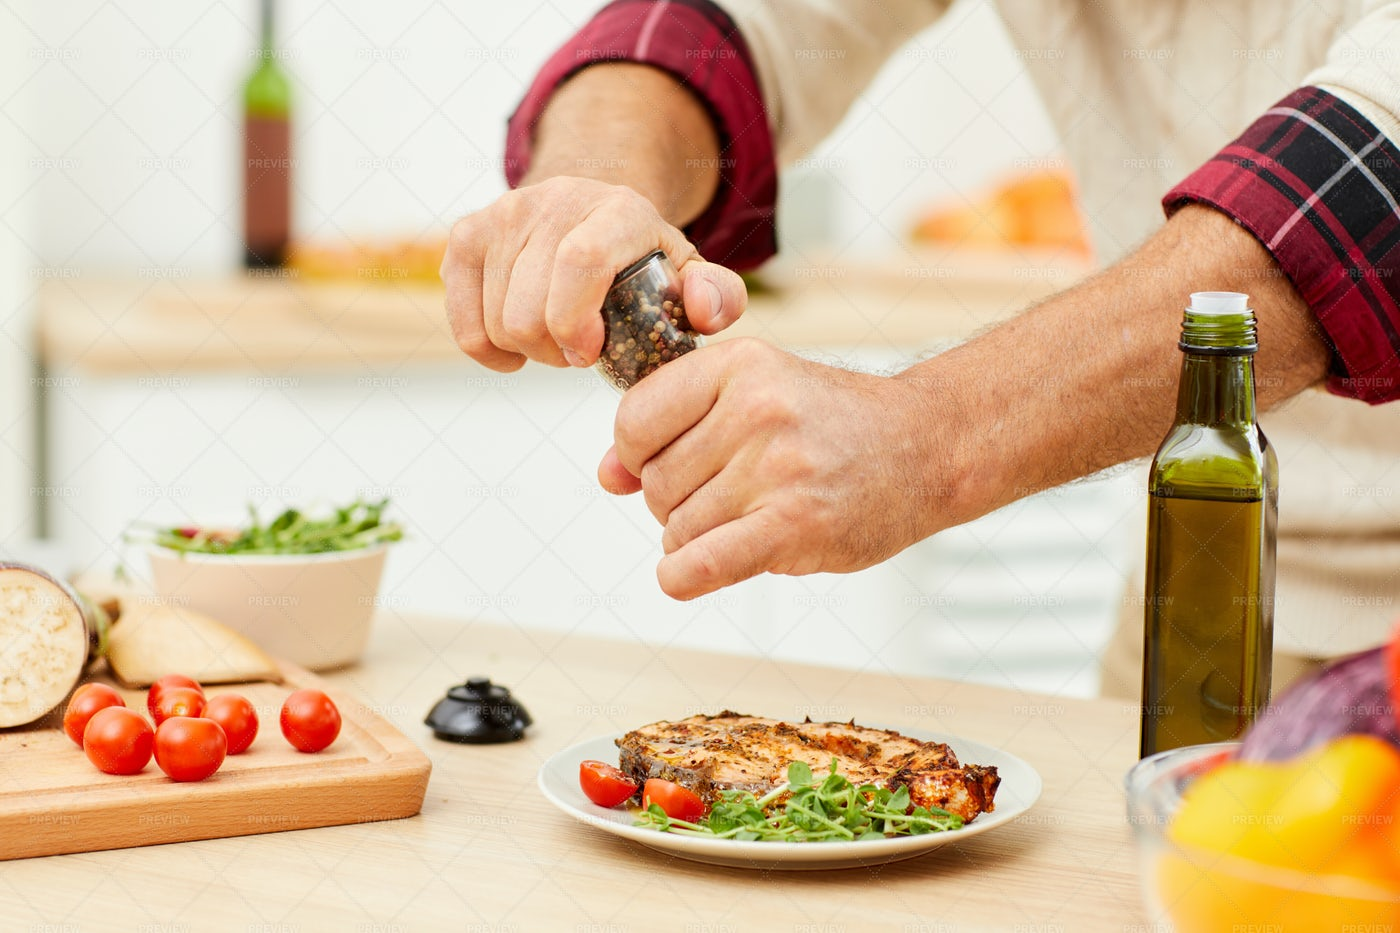 Man Seasoning Homemade Dish: Stock Photos